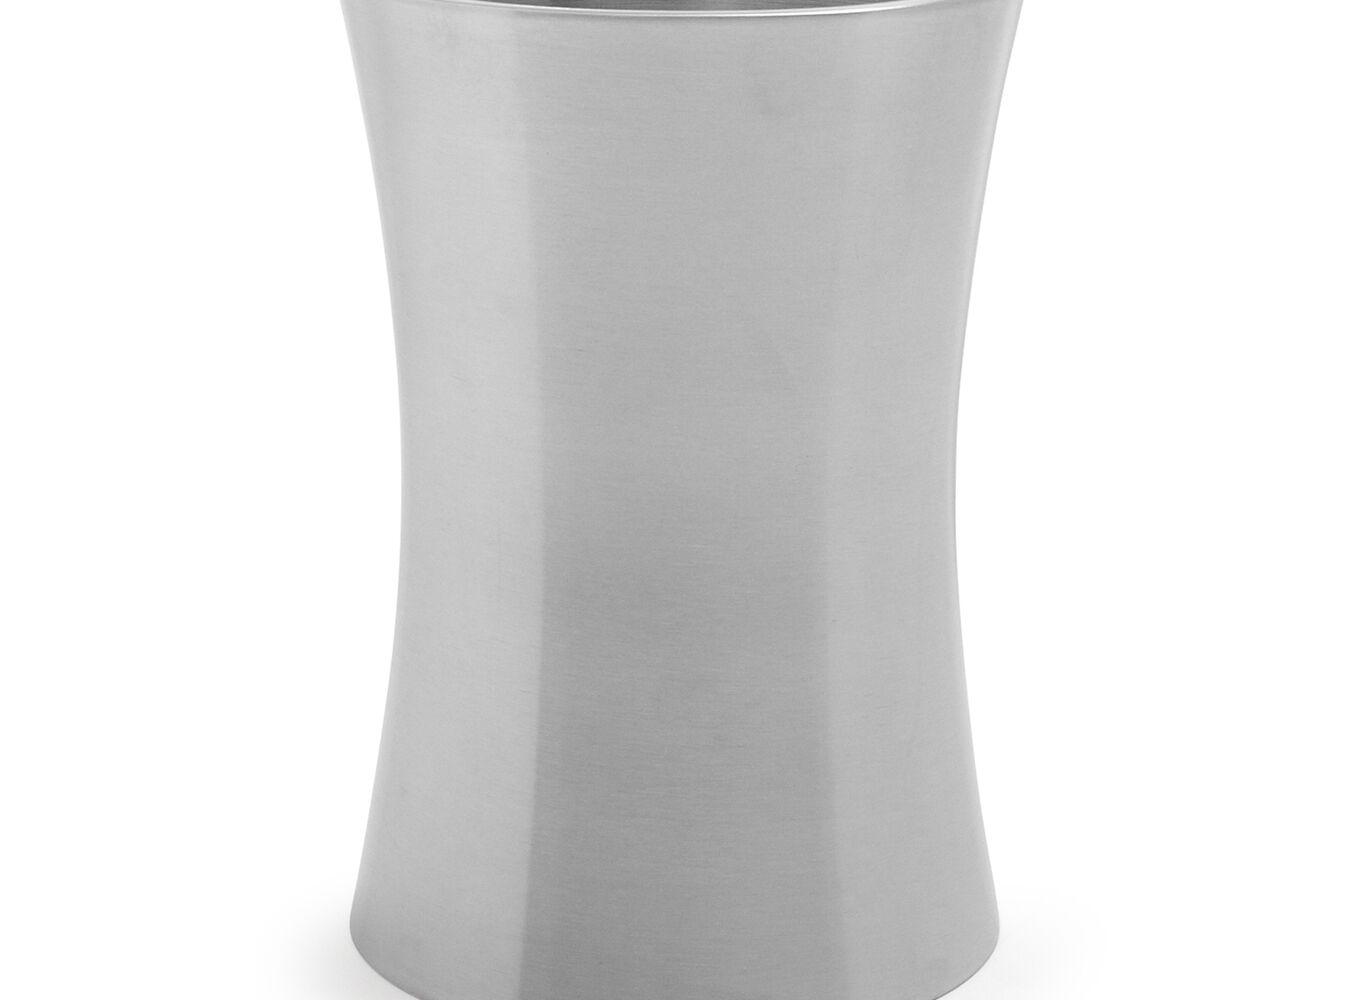 Fortessa Double-Wall Glacette Bucket | Sur La Table